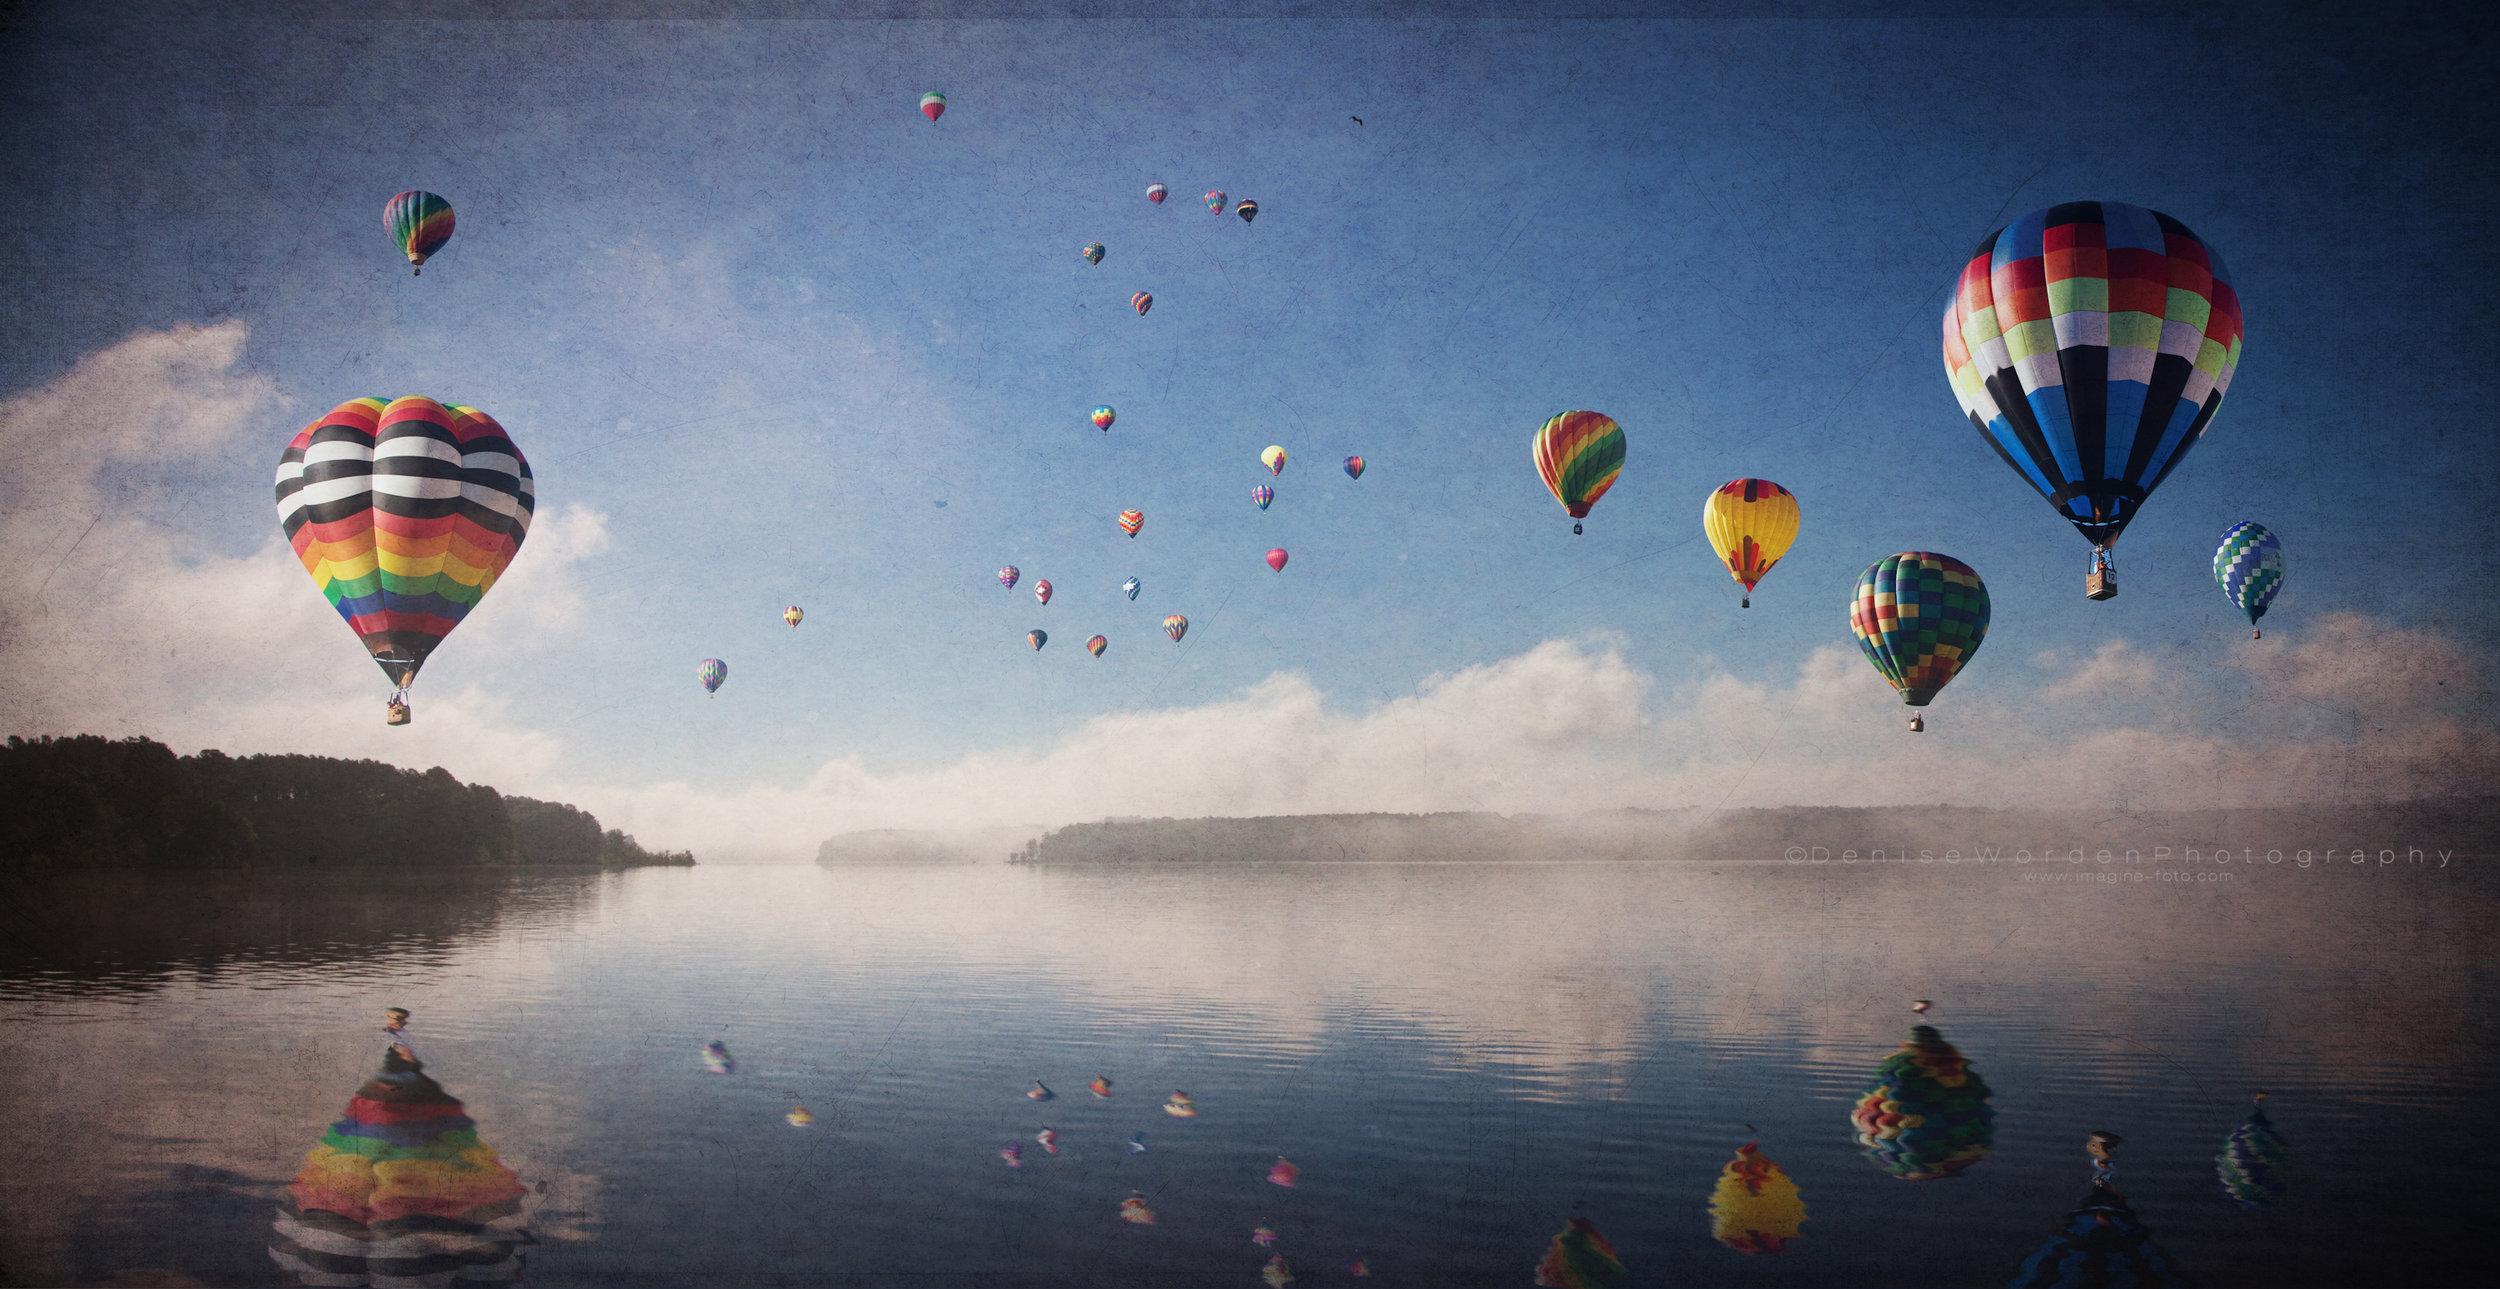 BalloonsComposite_2_IMG_0020 copy